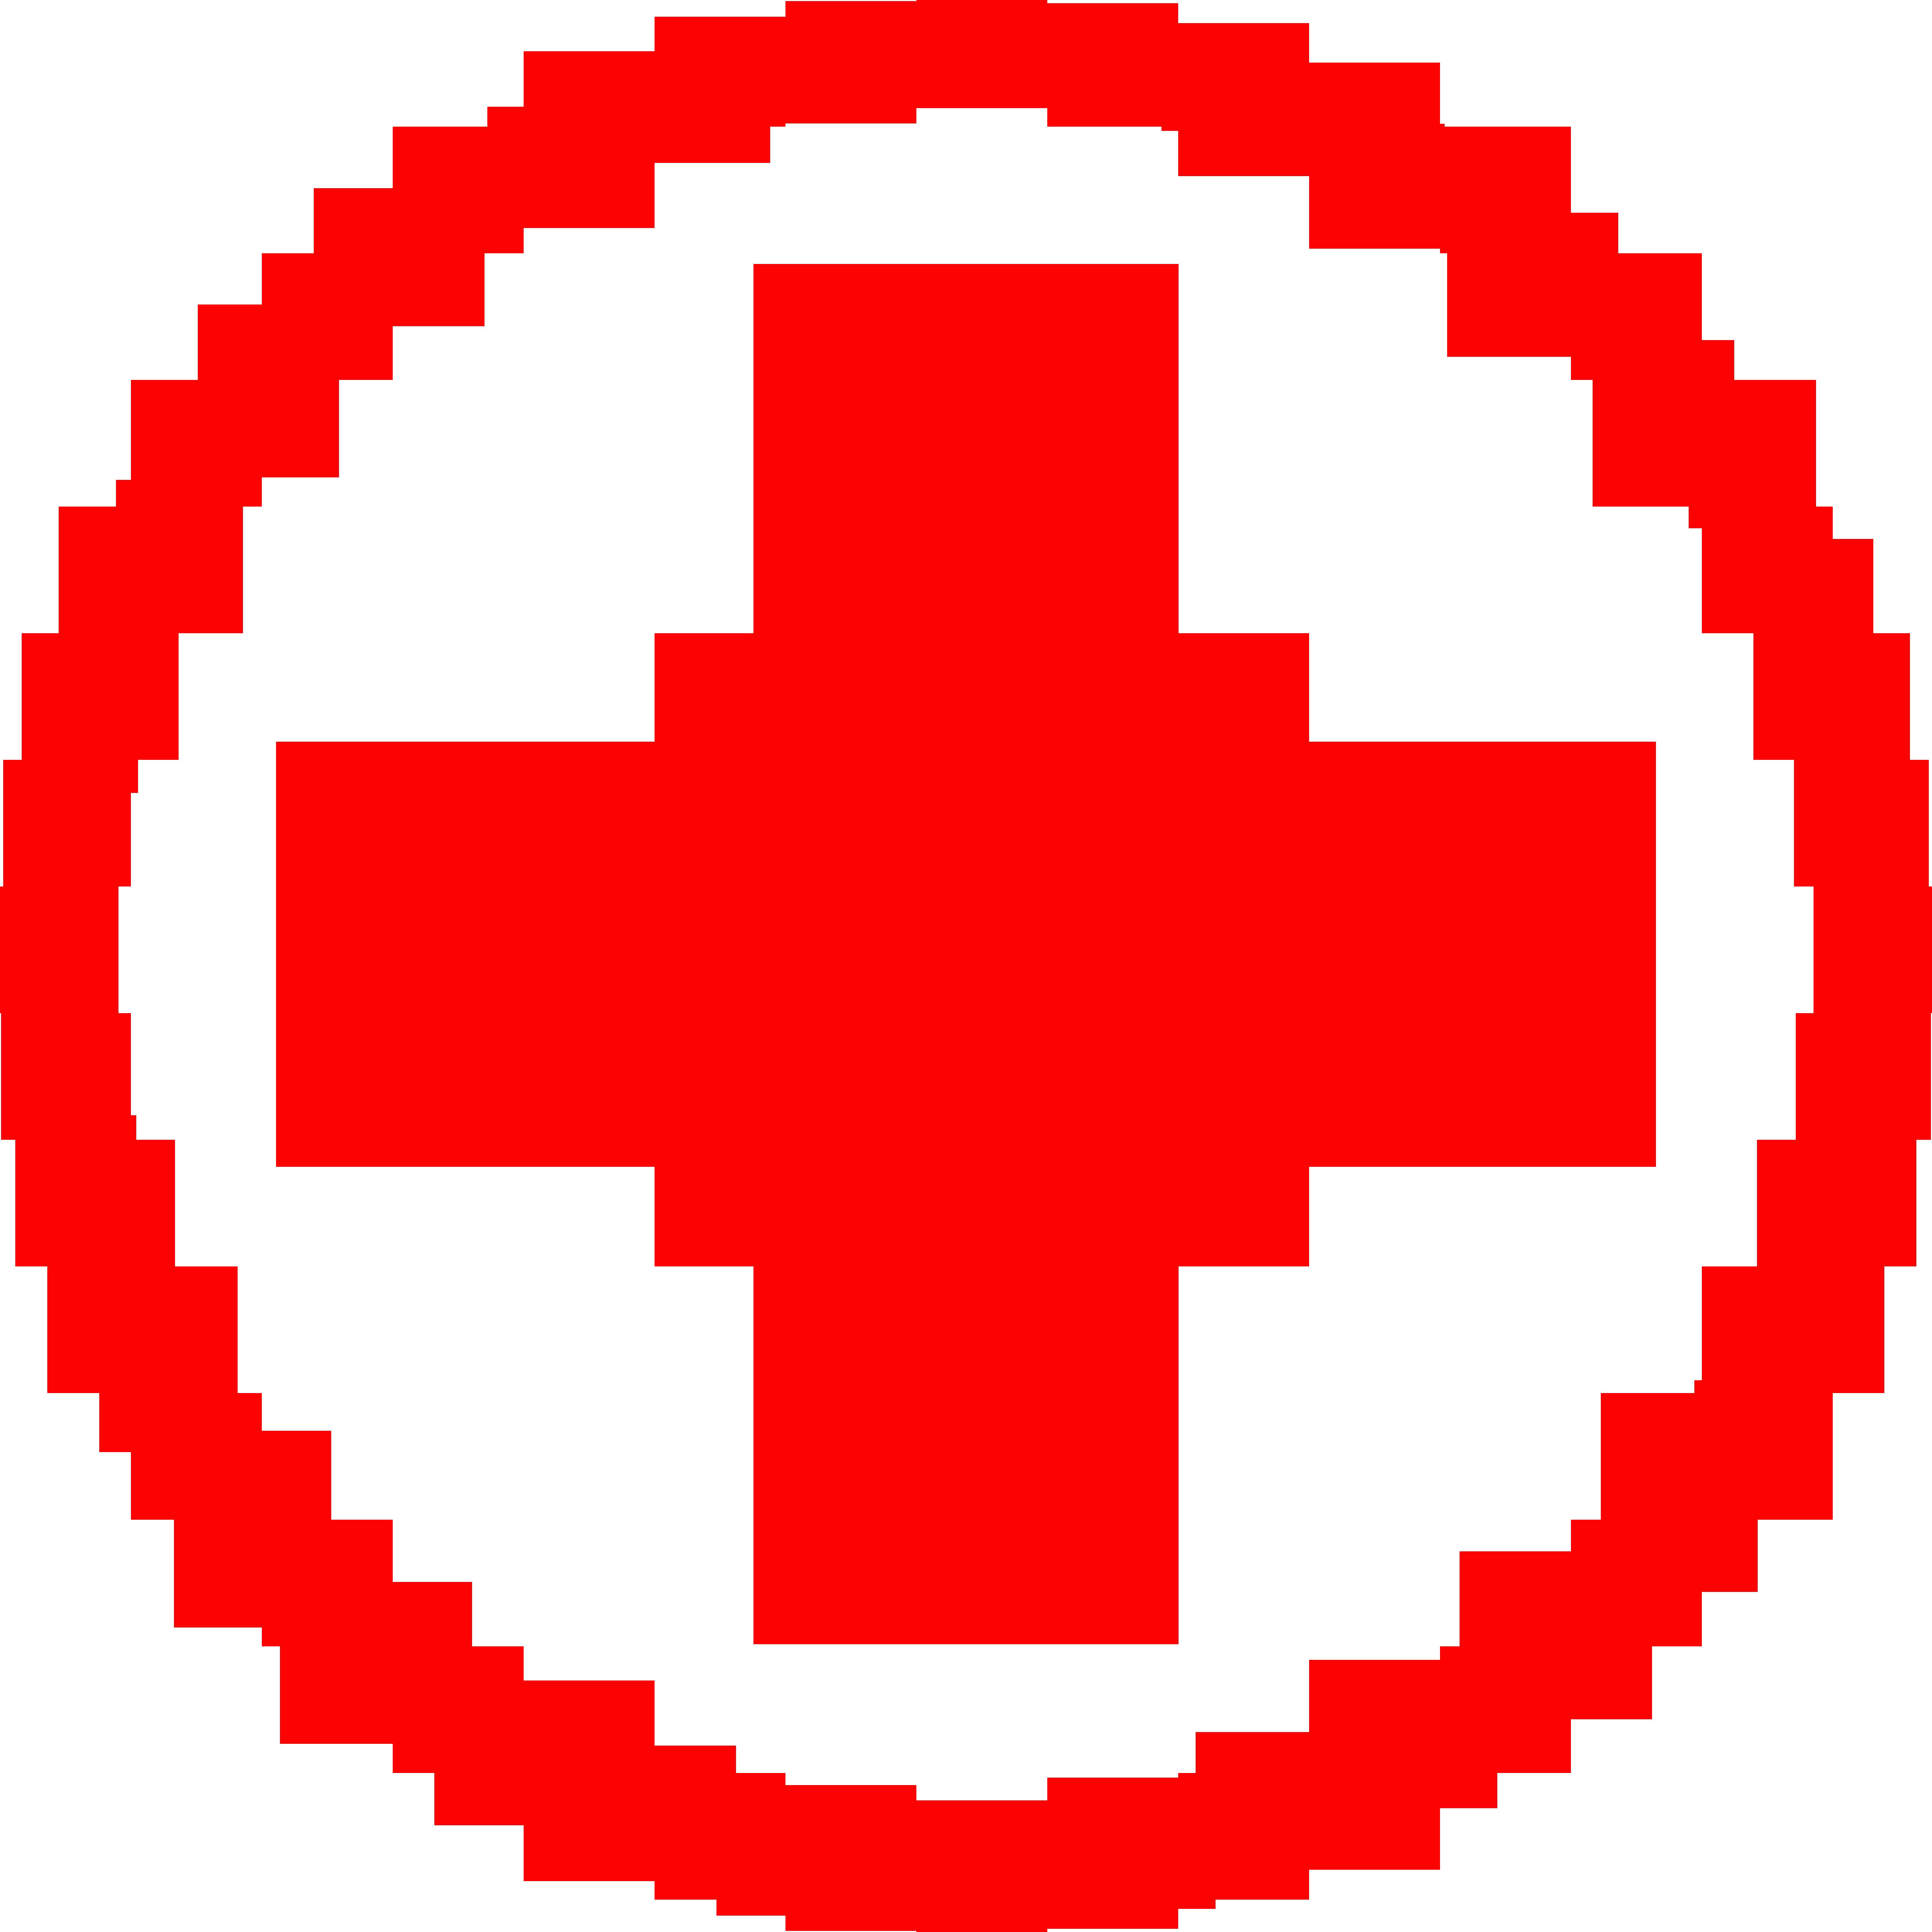 clipart logo - photo #35